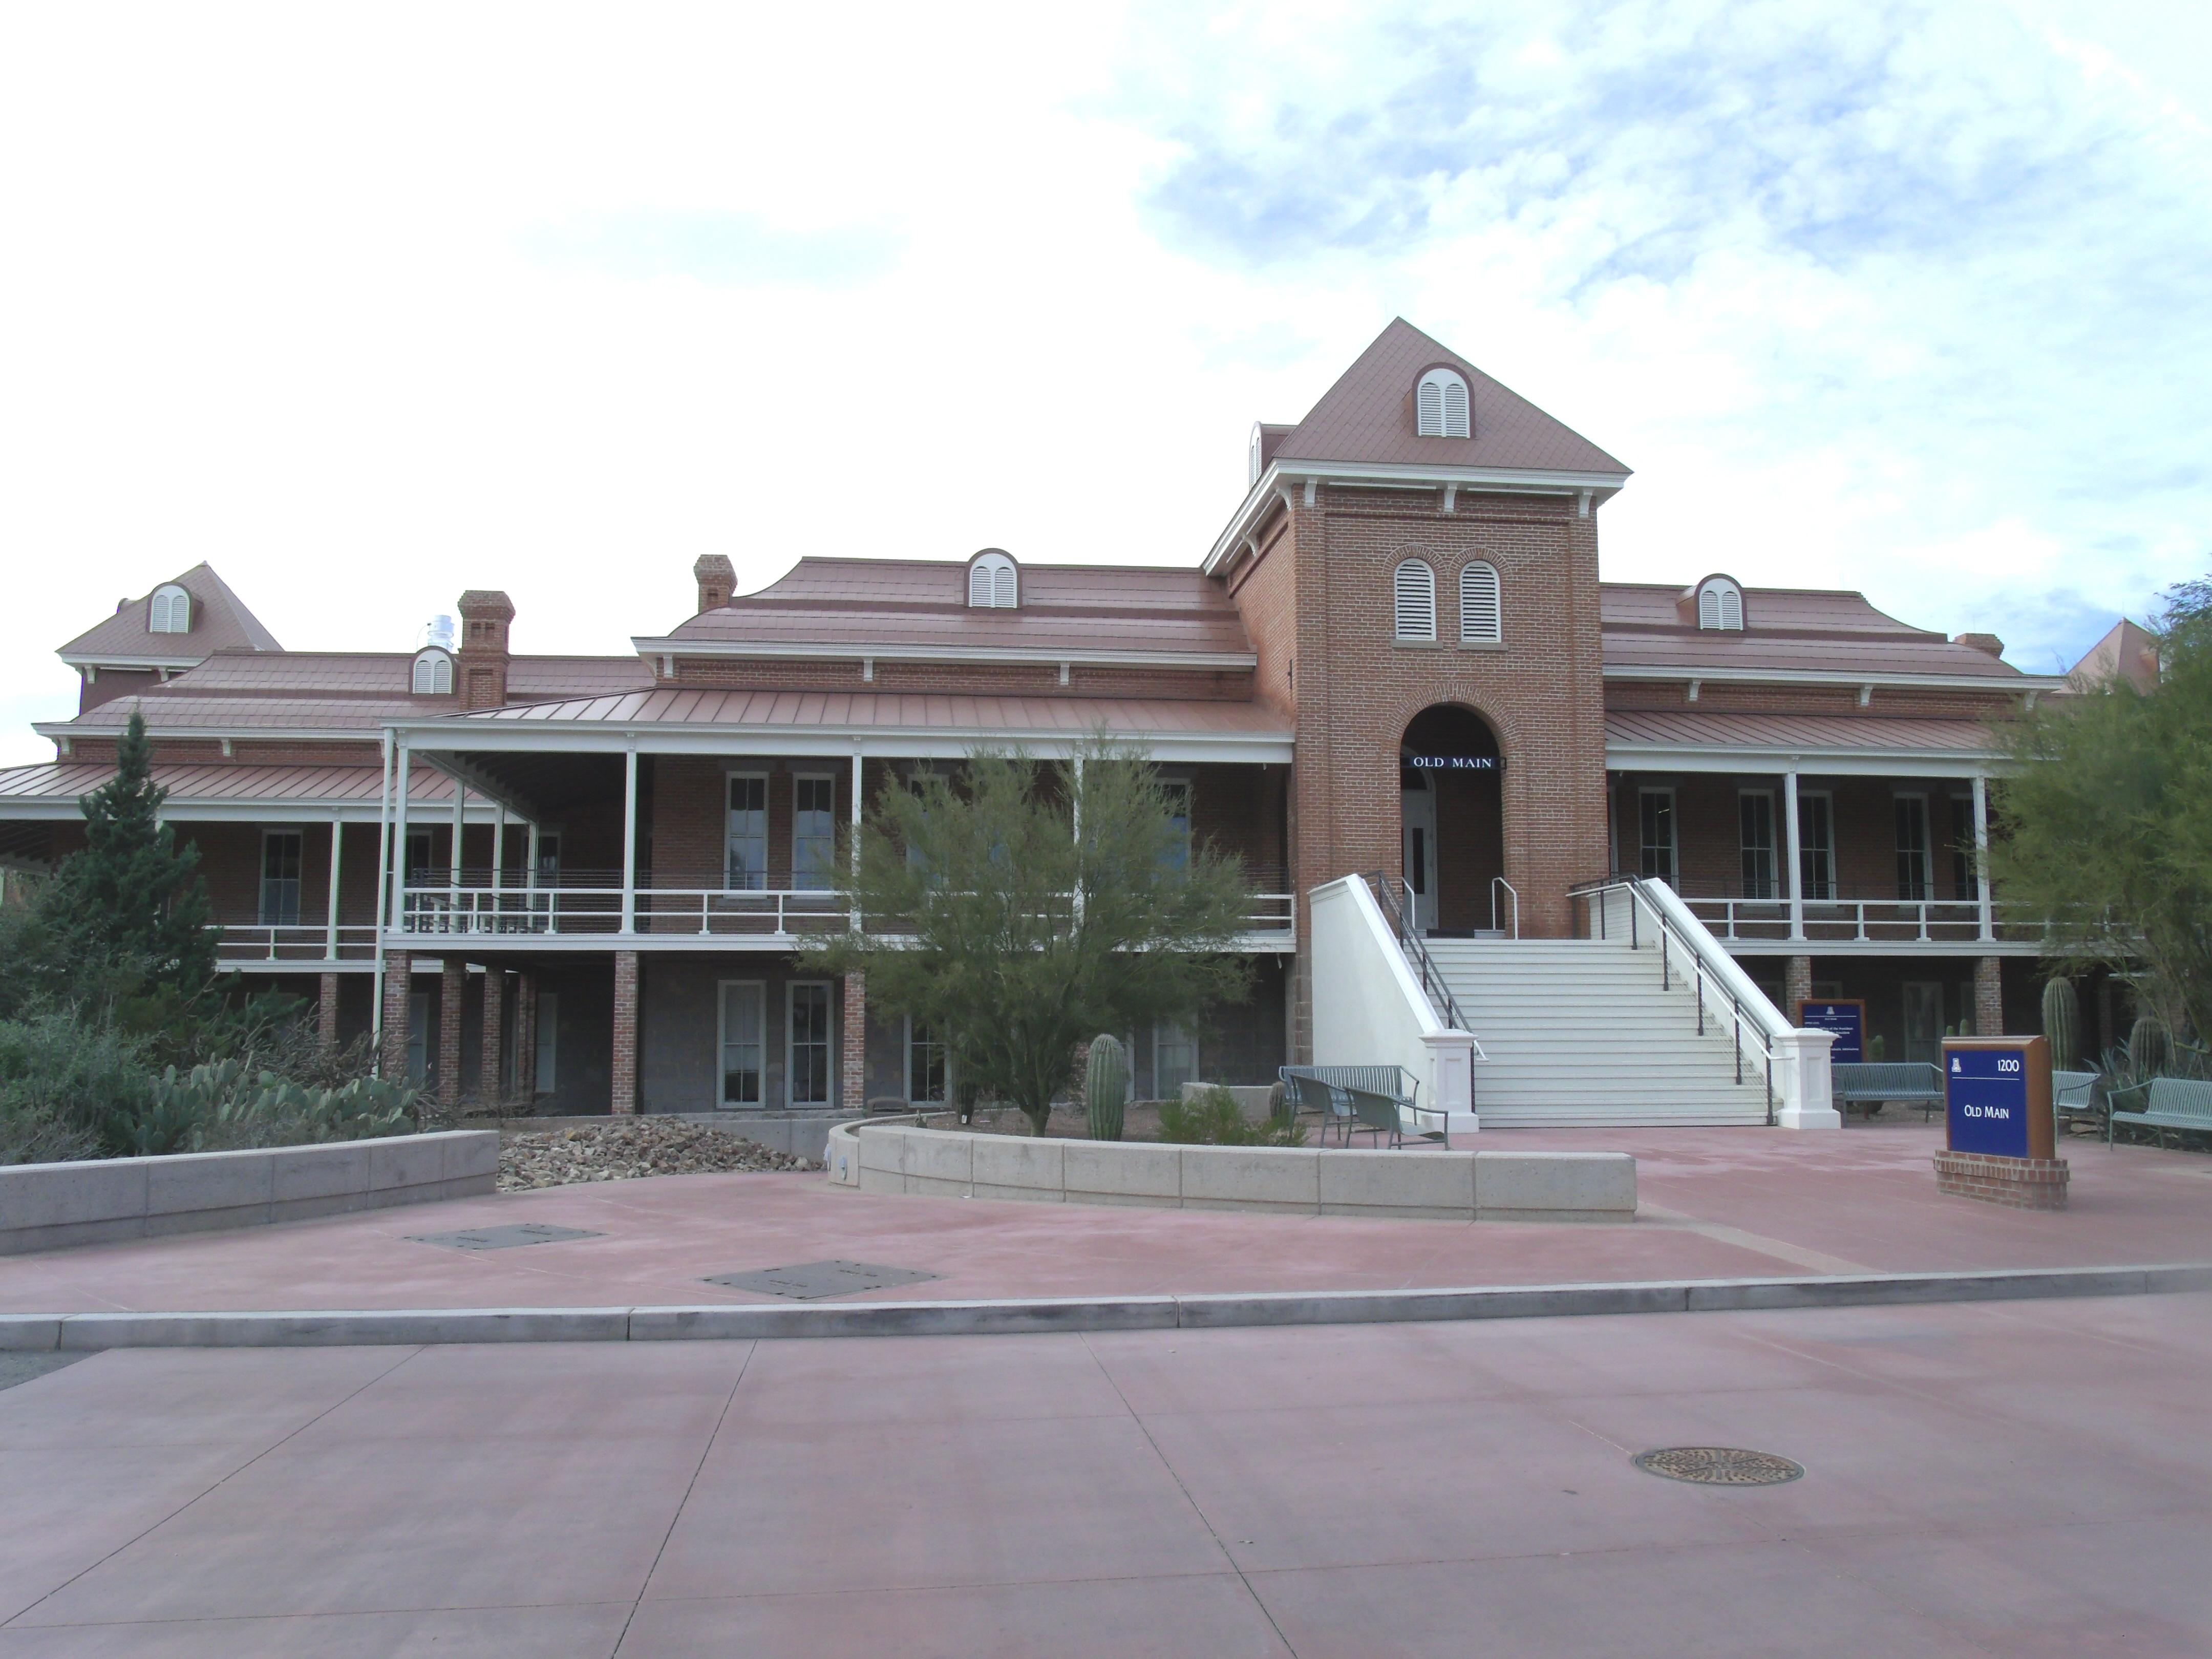 file tucson old main university of arizona building 1875 jpg